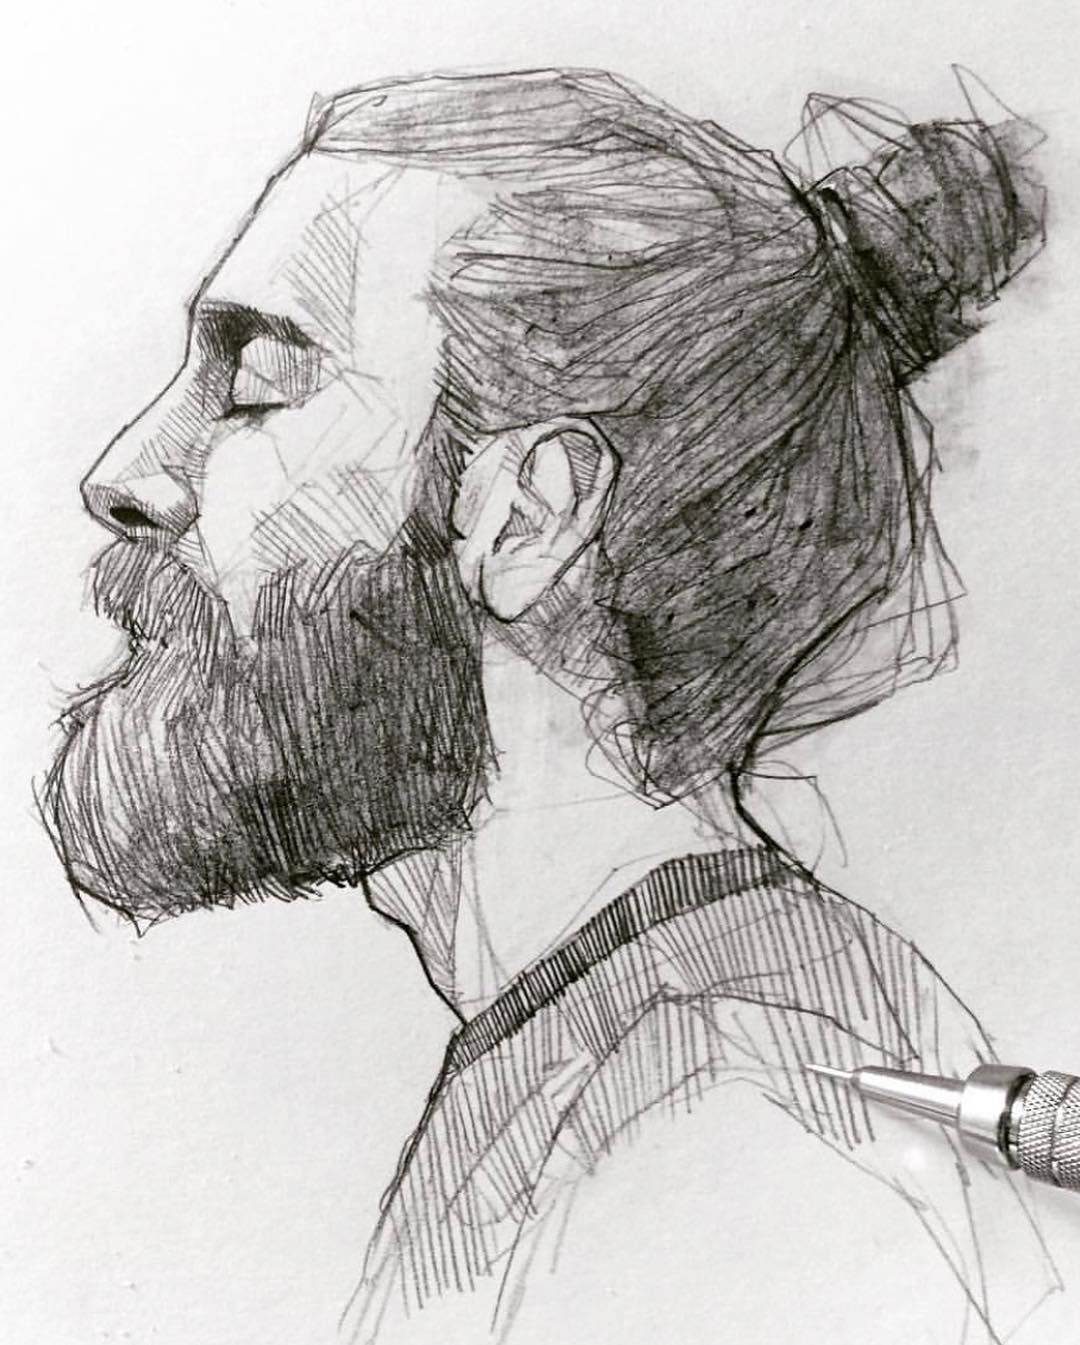 Pencil Sketch Artist Efrain Malo Art Sketchbook Art Drawings Sketches Sketches Of People